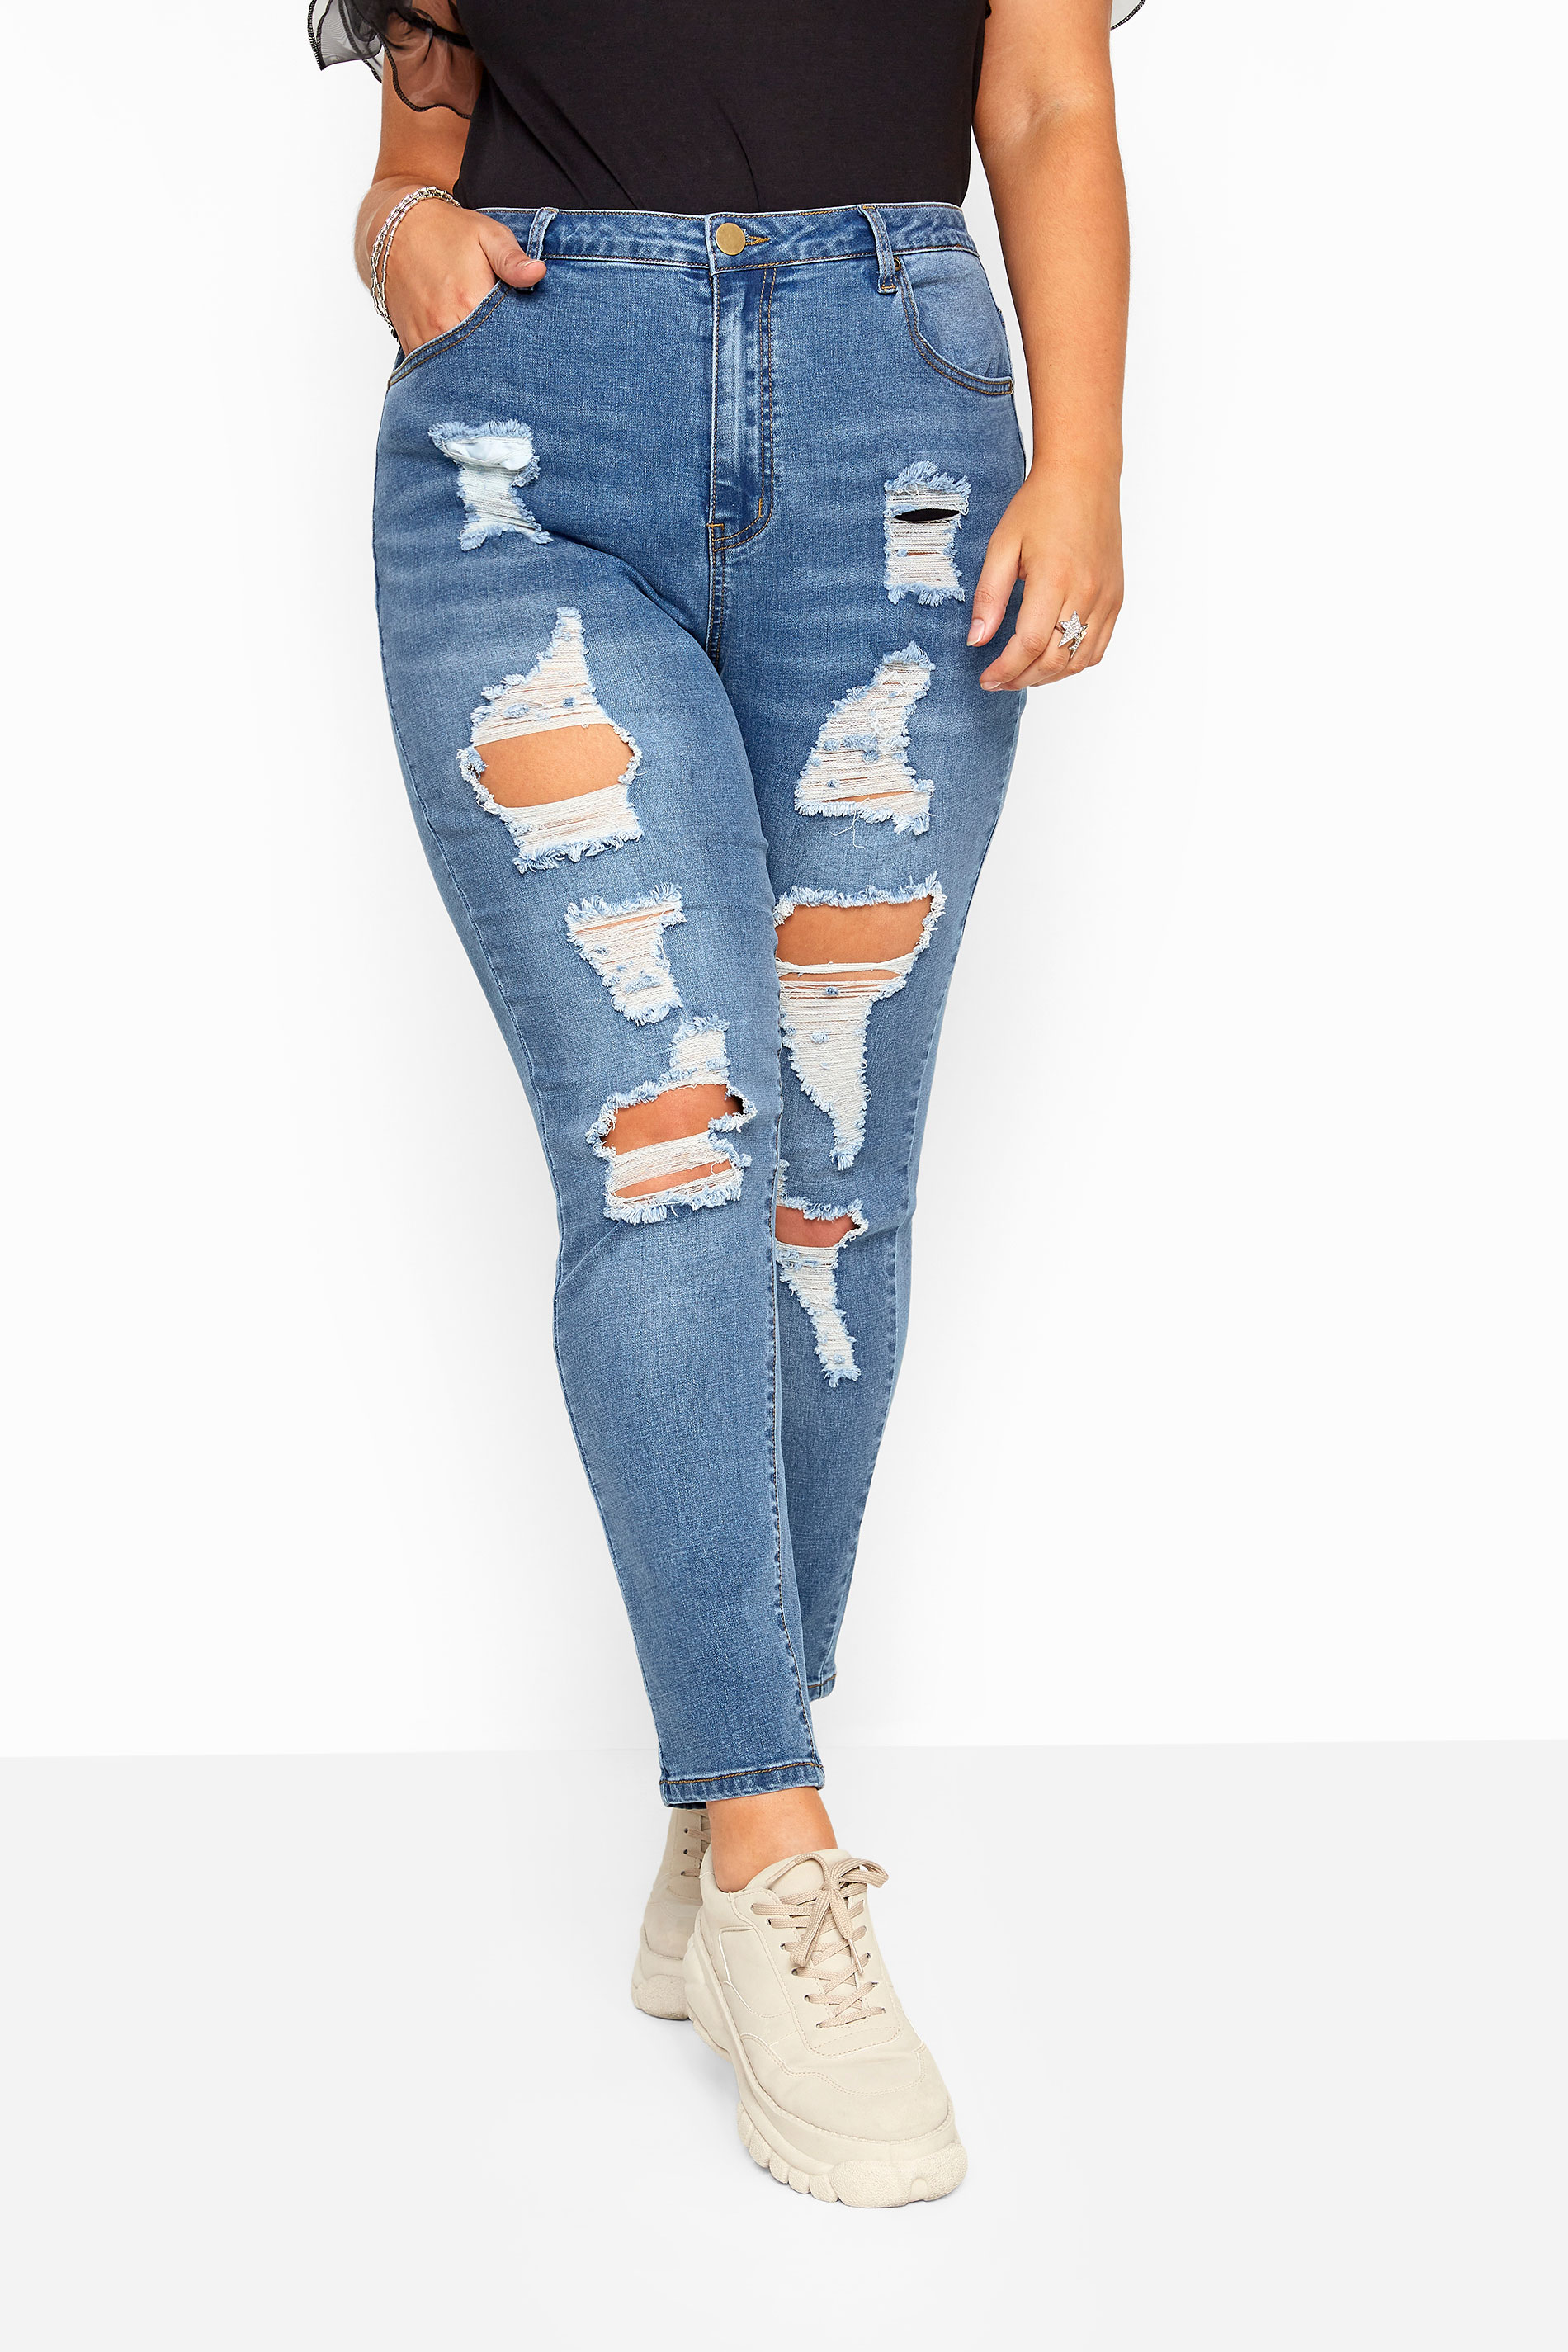 AVA Skinny Stretch-Jeans mit Rissen - Blau